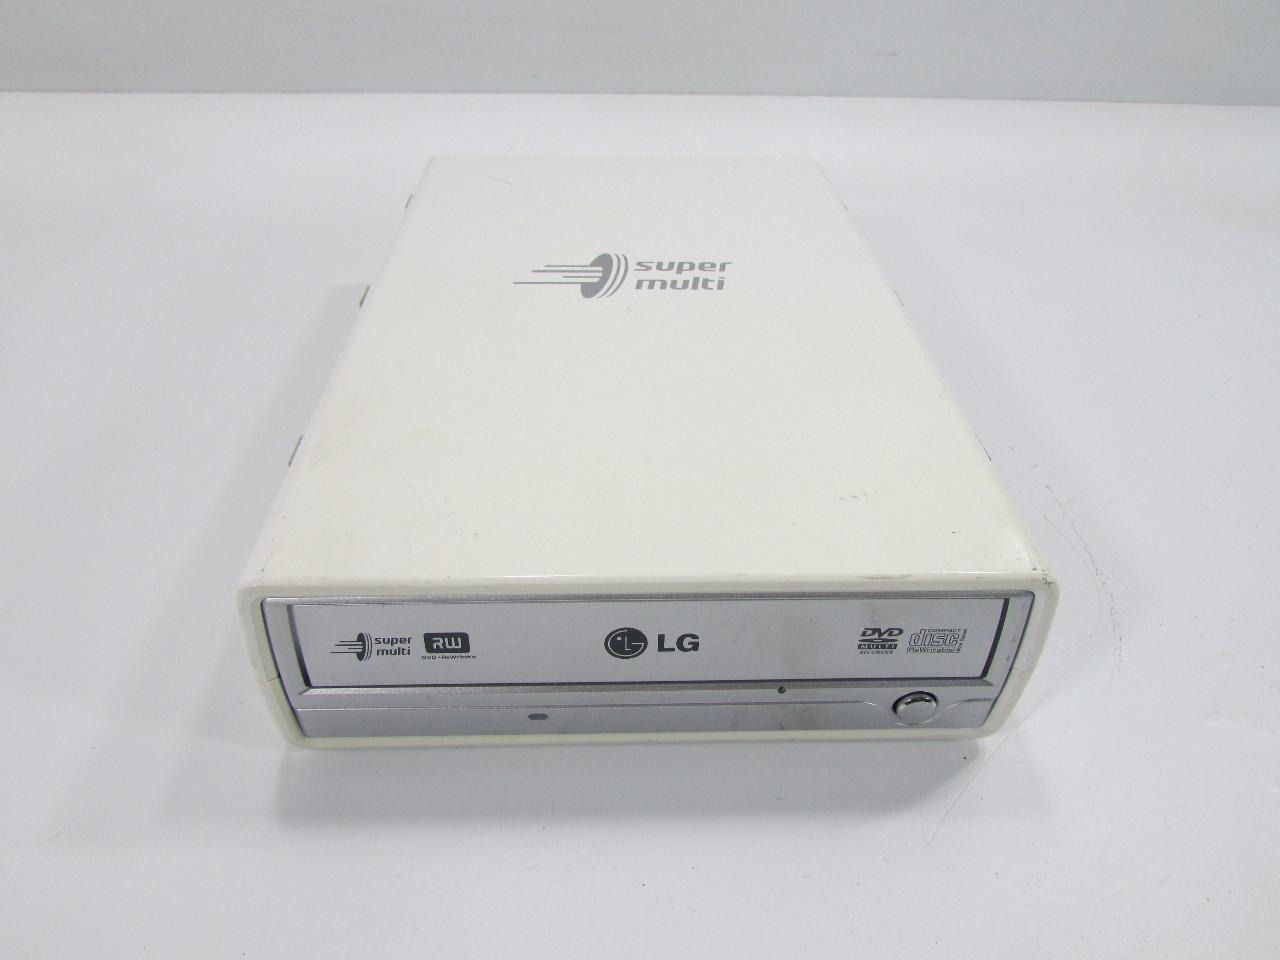 Lg gsa-5163d driver for mac goodtextscope's blog.